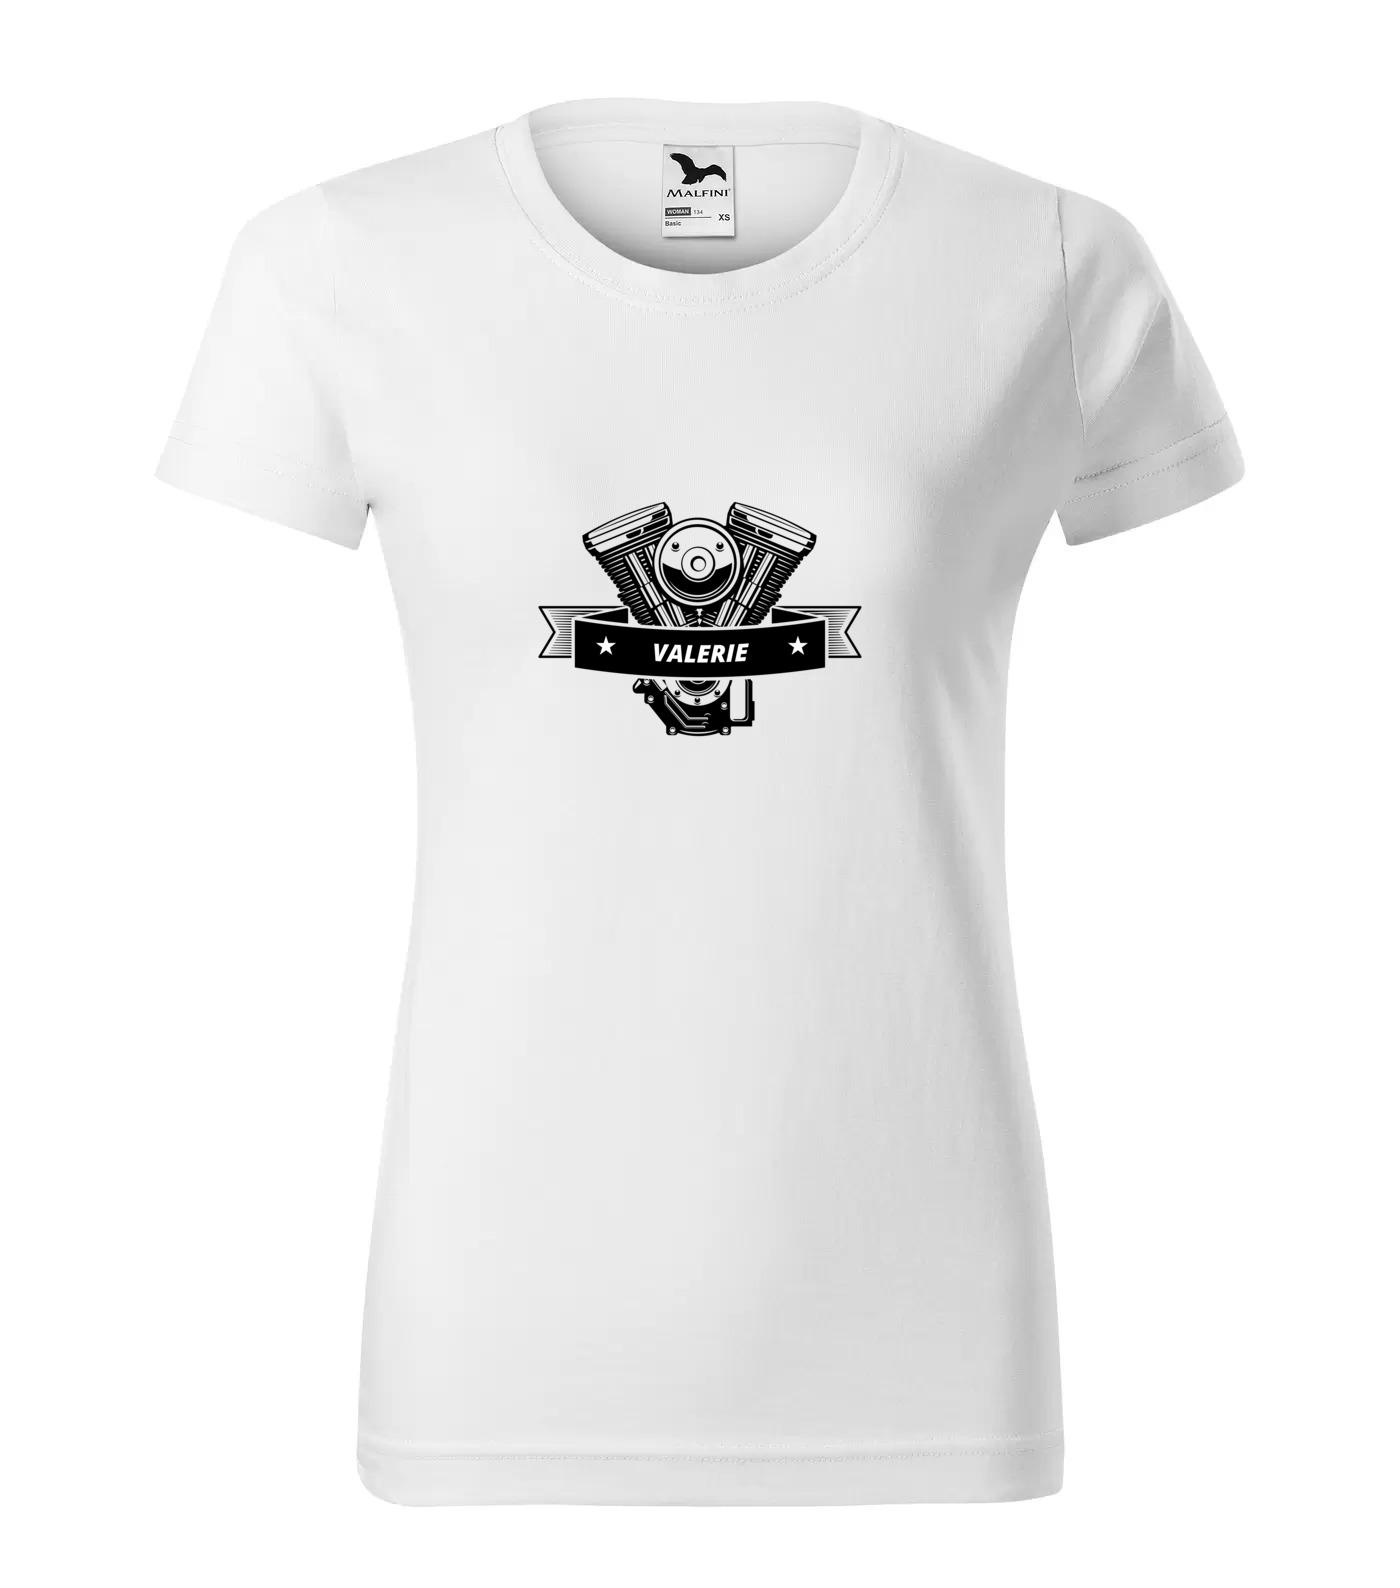 Tričko Motorkářka Valerie